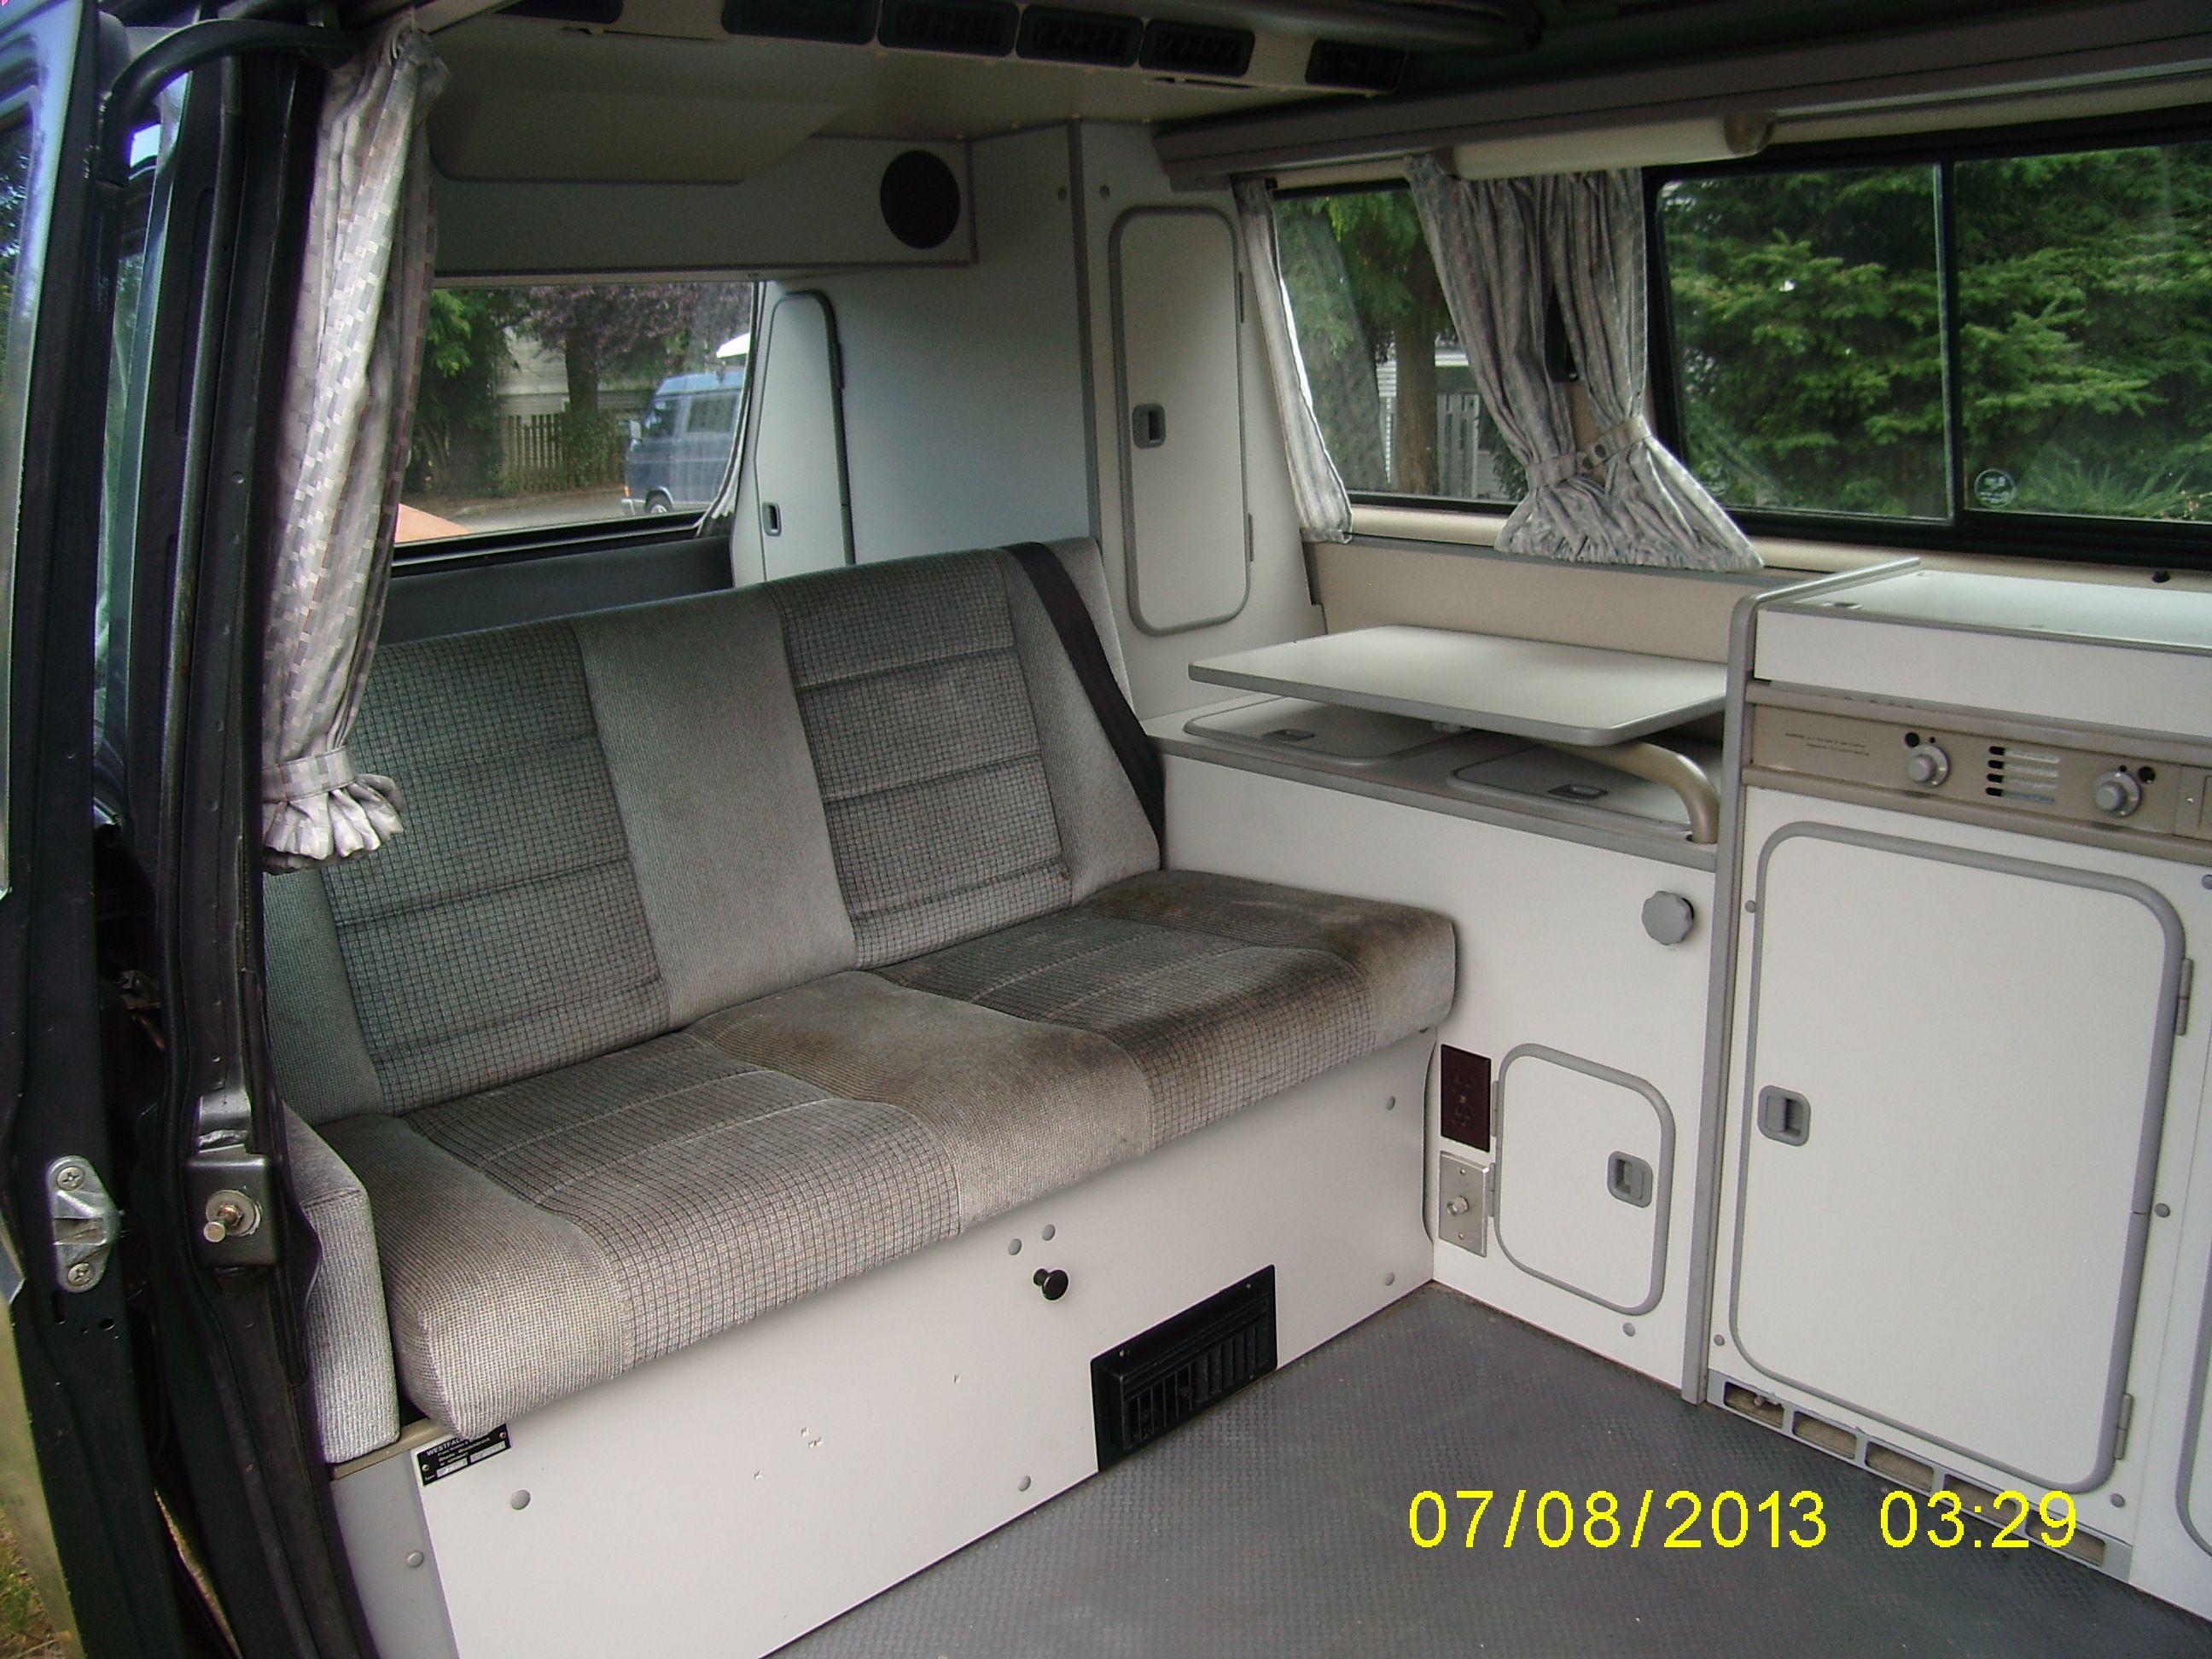 Volkswagen bus vanagon take a look volkswagon new interior run and - Vw Syncro 1989 Vanagon Westfalia Interior